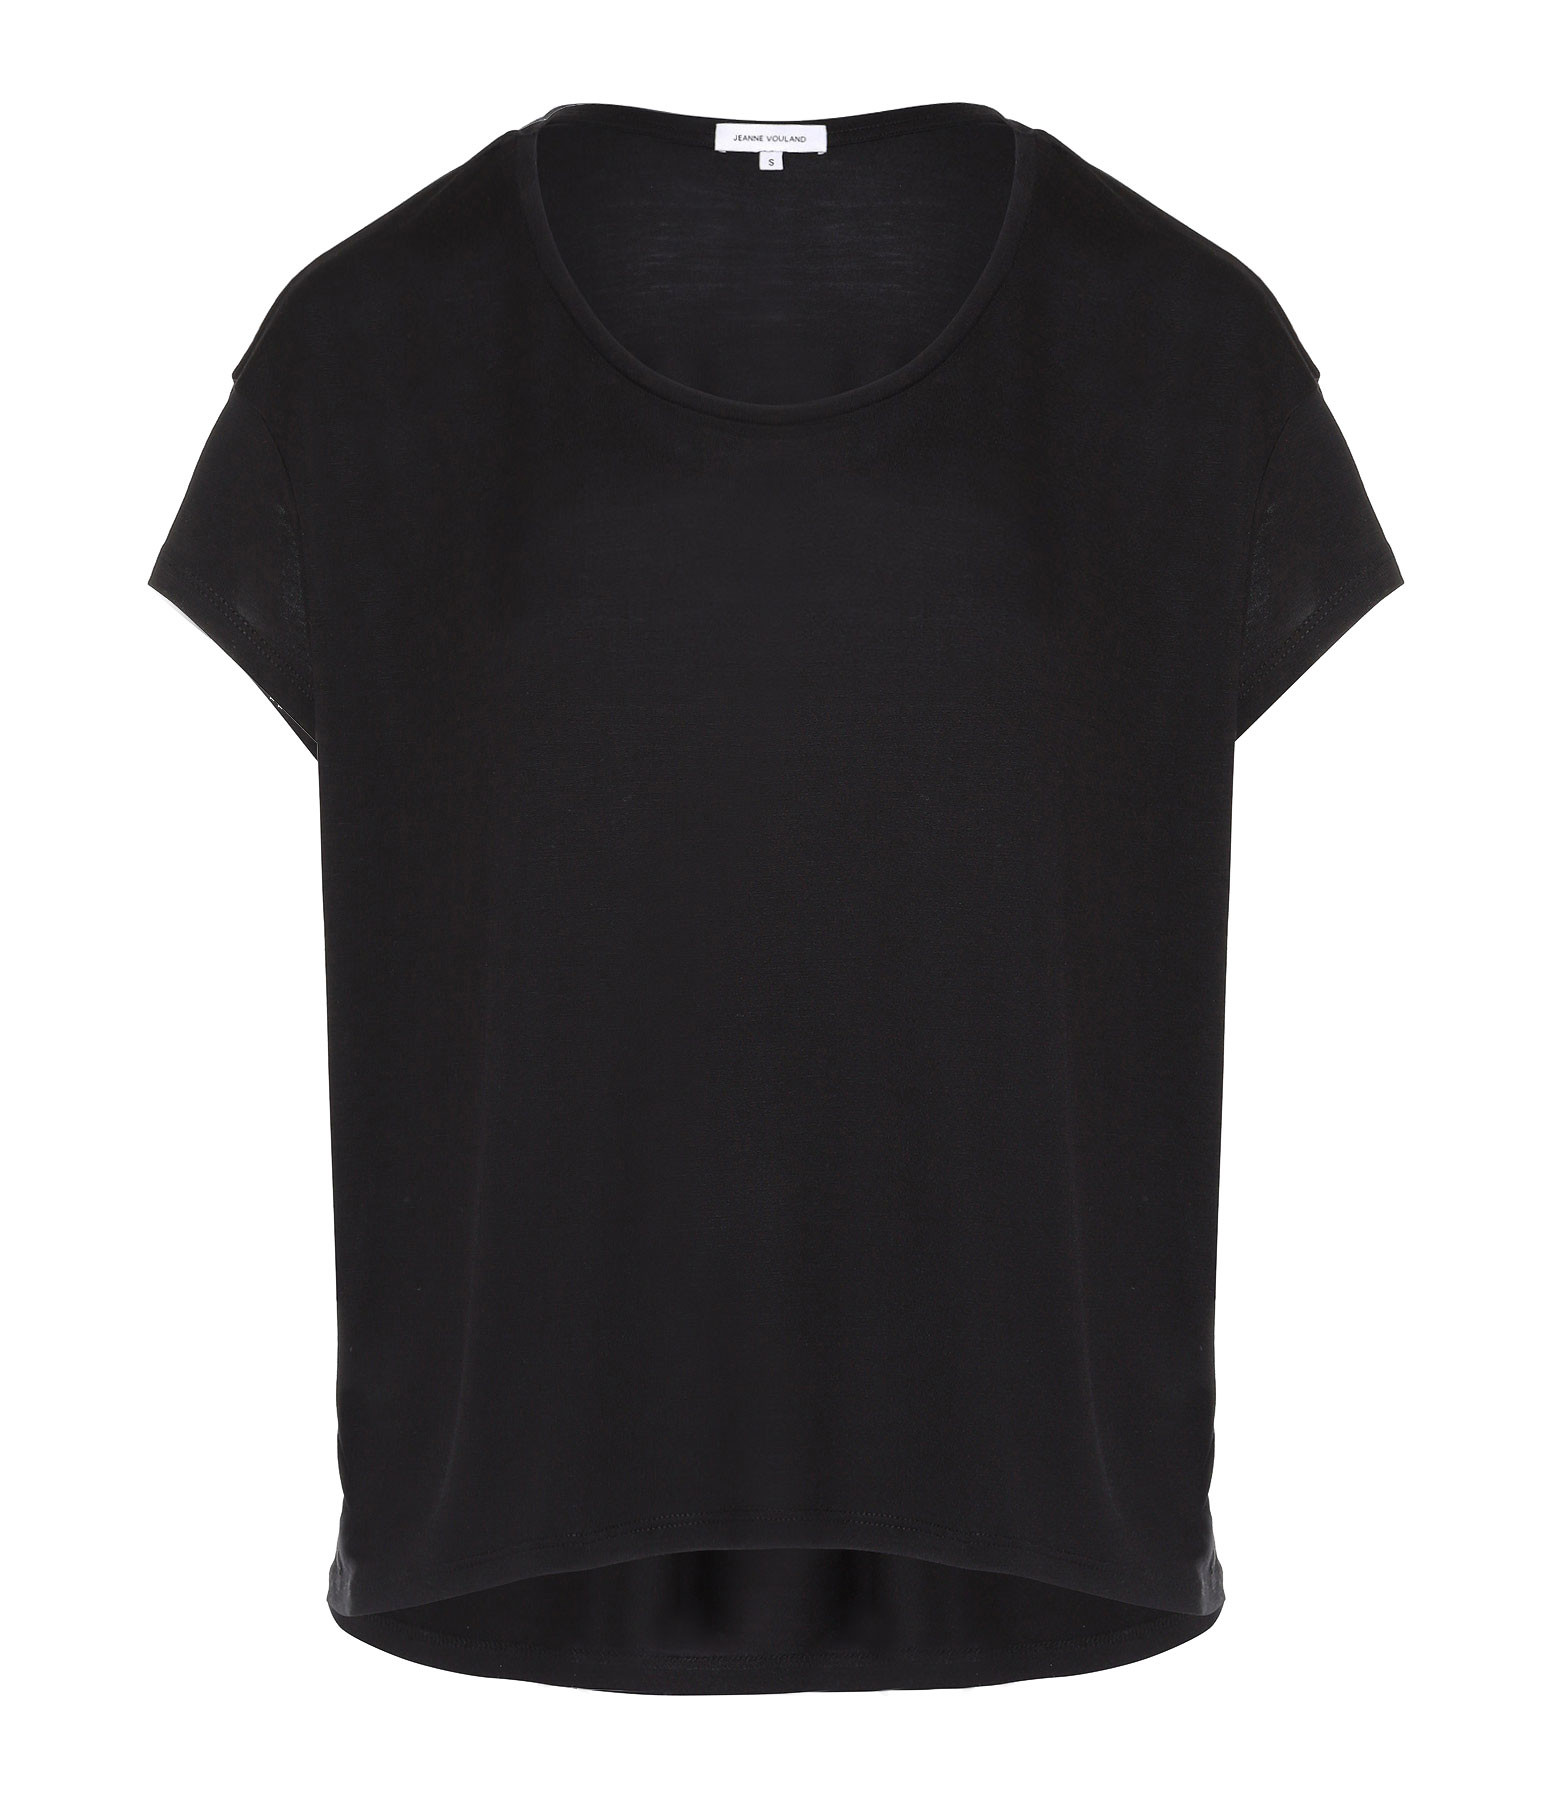 JEANNE VOULAND - Tee-shirt Bach Lyocell Noir